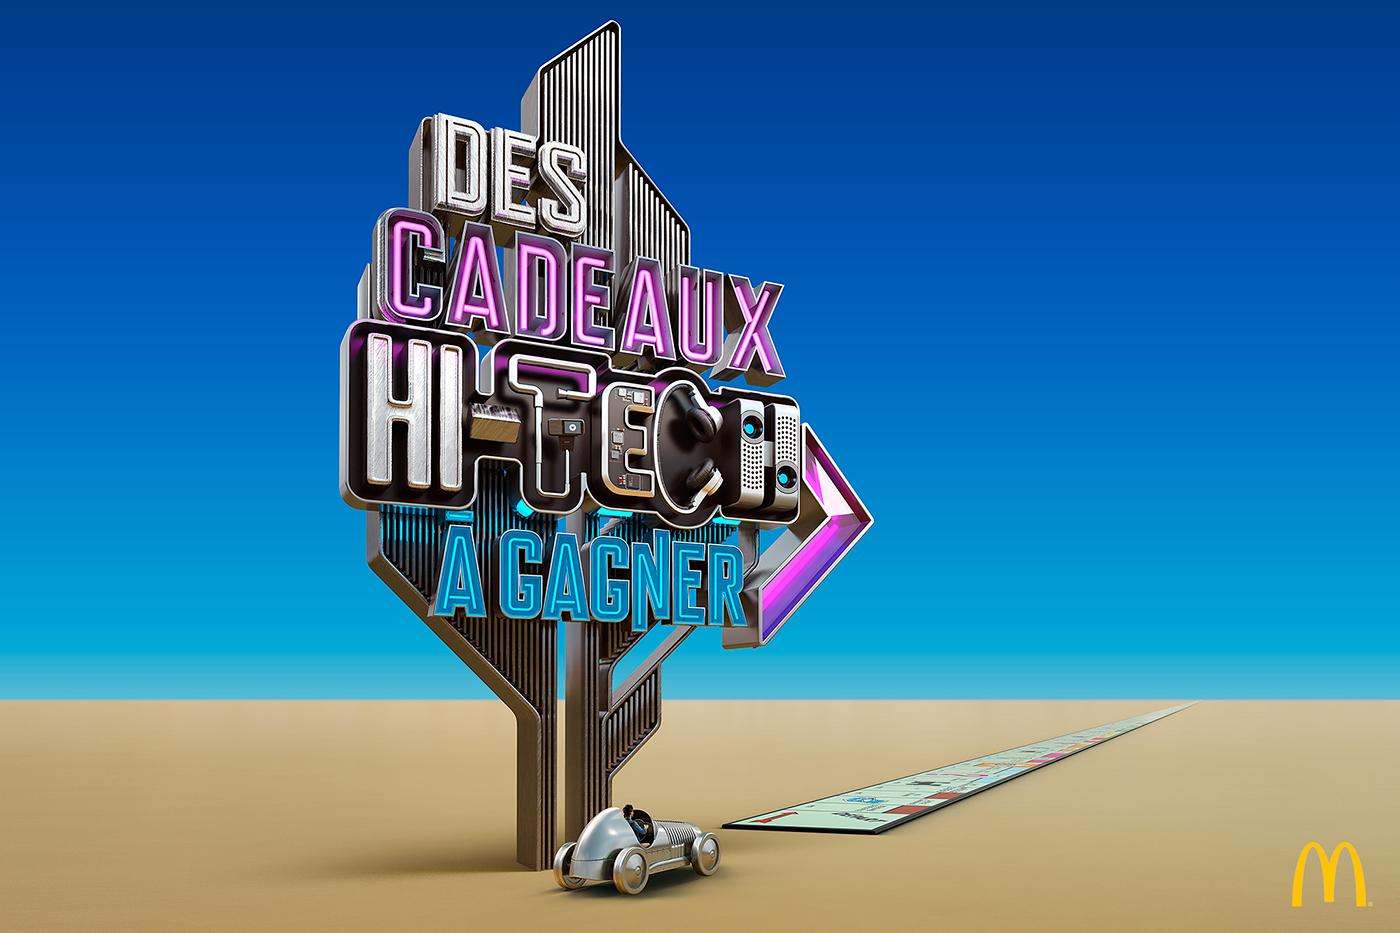 McDonalds Monopoly Games signs desert CGI 3D typography 3D Type